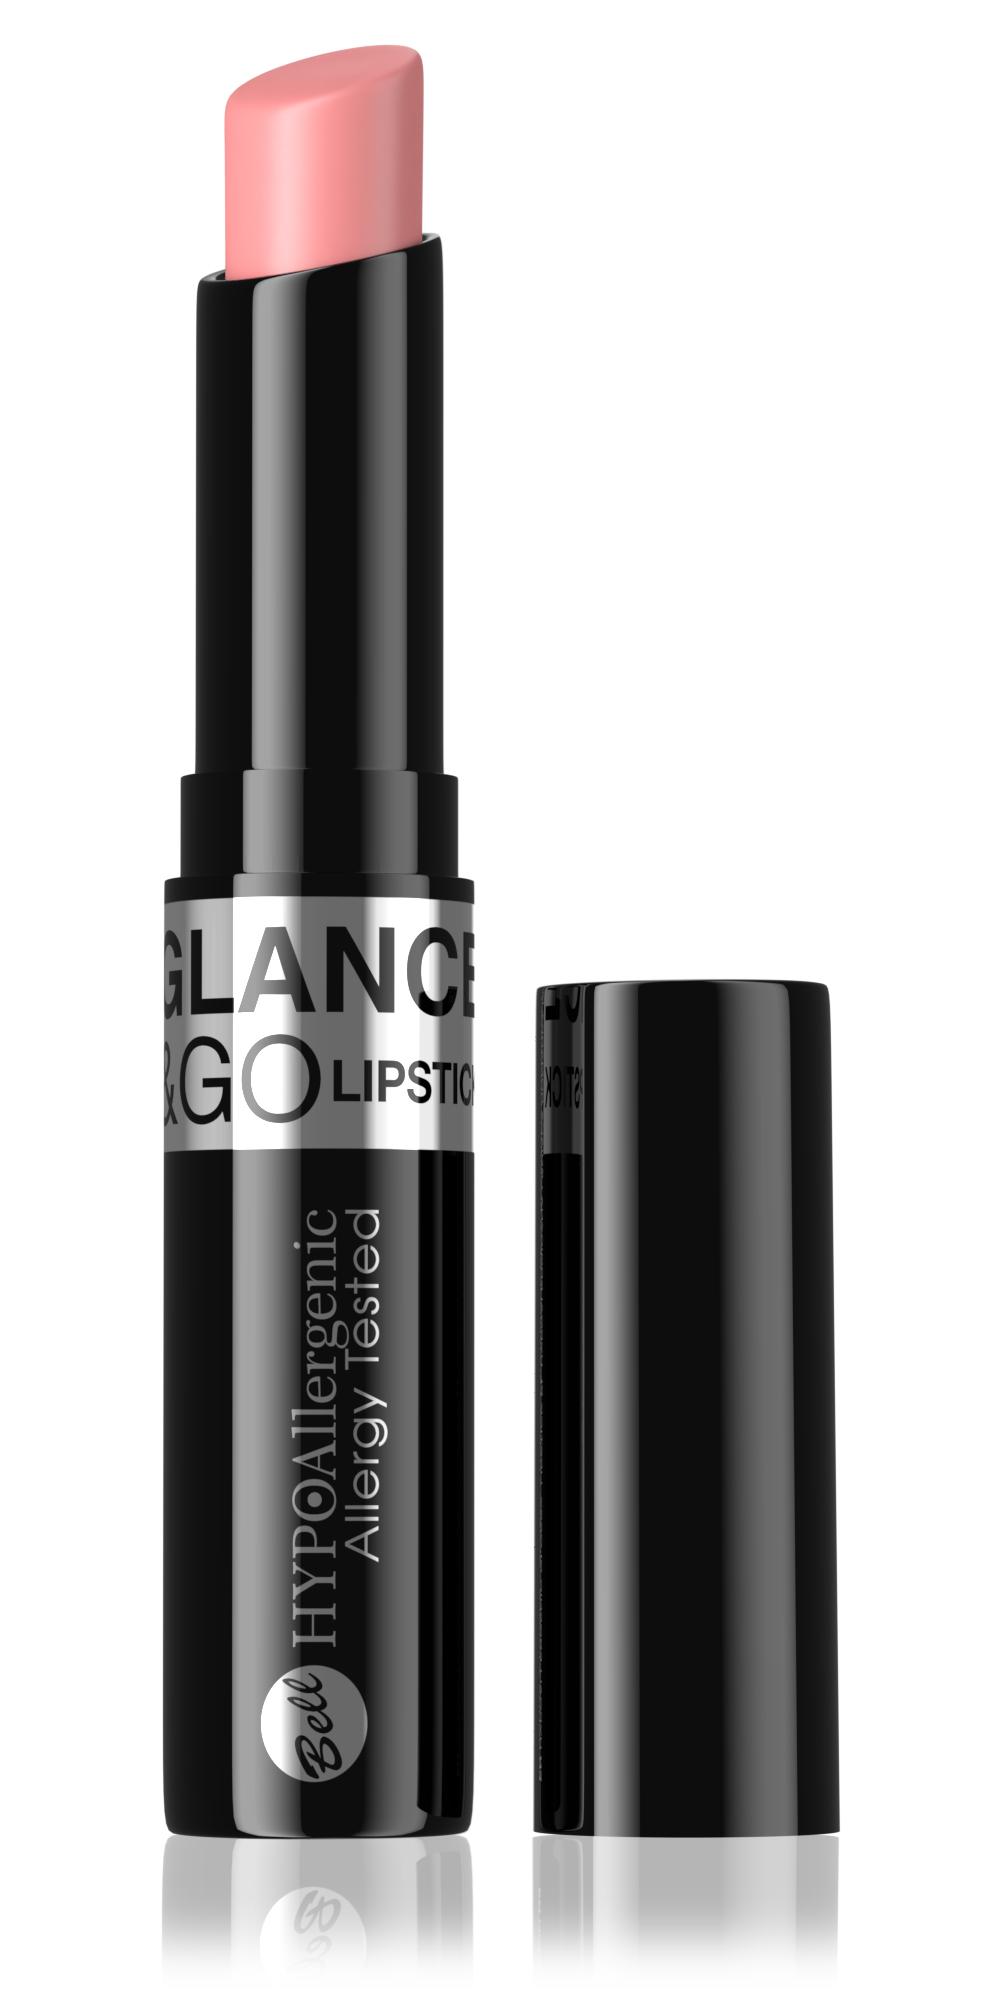 HYPOAllergenic Glance&Go Lipstick